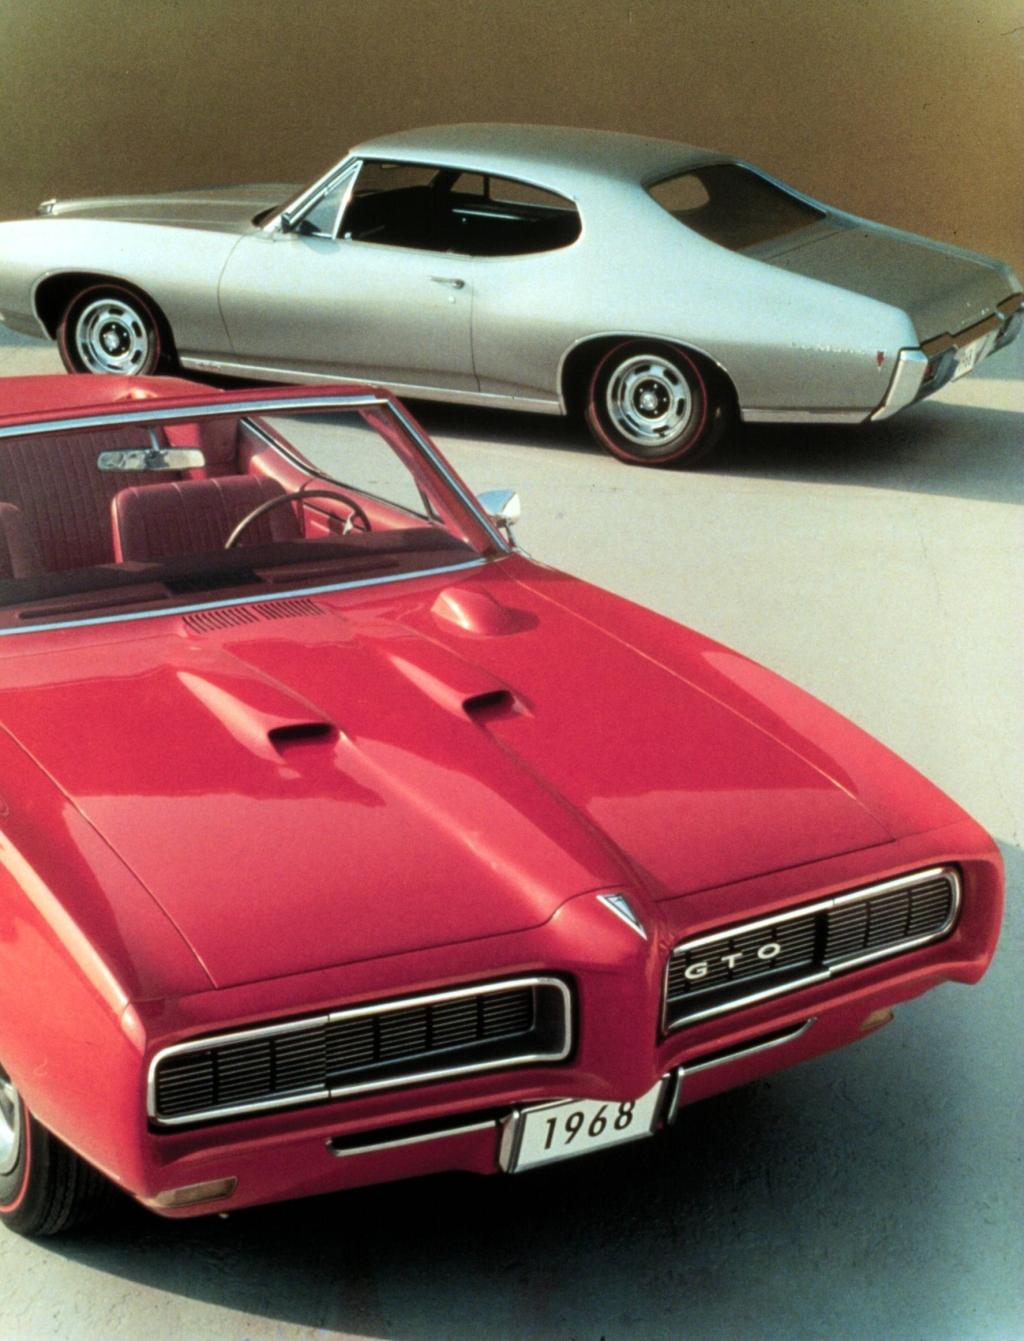 1968 Pontiac GTO advertisement